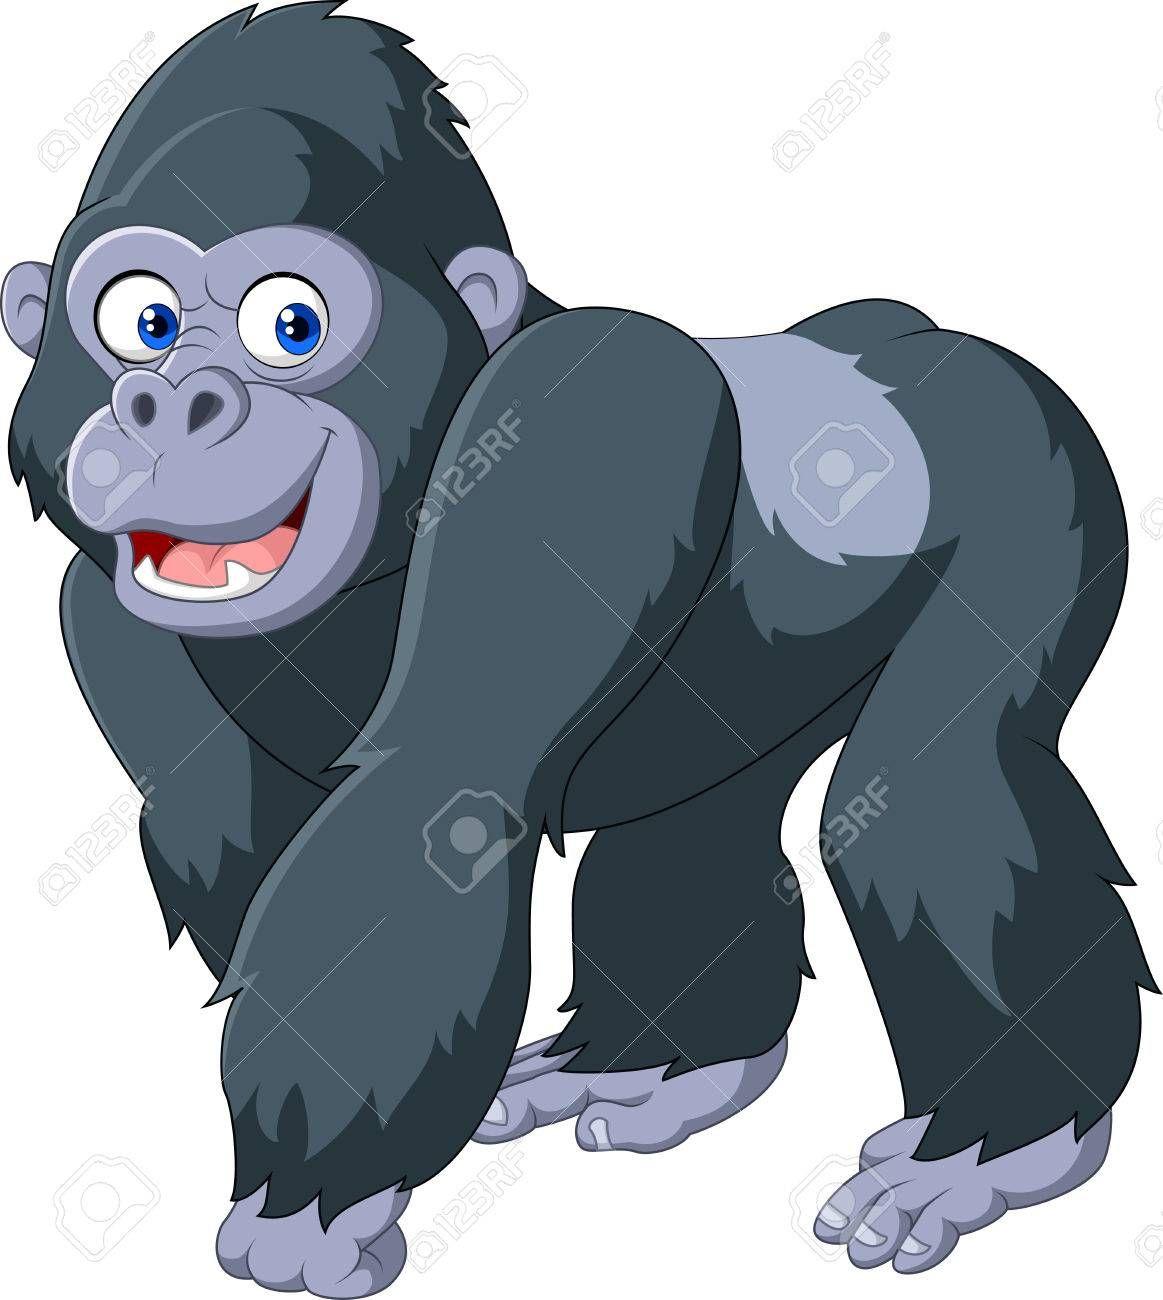 Https Www 123rf Com Clipart Vector Zoo Html Alttext 1 Start 100 Sti Mf5j6eb5vwmq5qmtoj Mediapopu Baby Animal Drawings Animal Coloring Pages Cartoon Clip Art